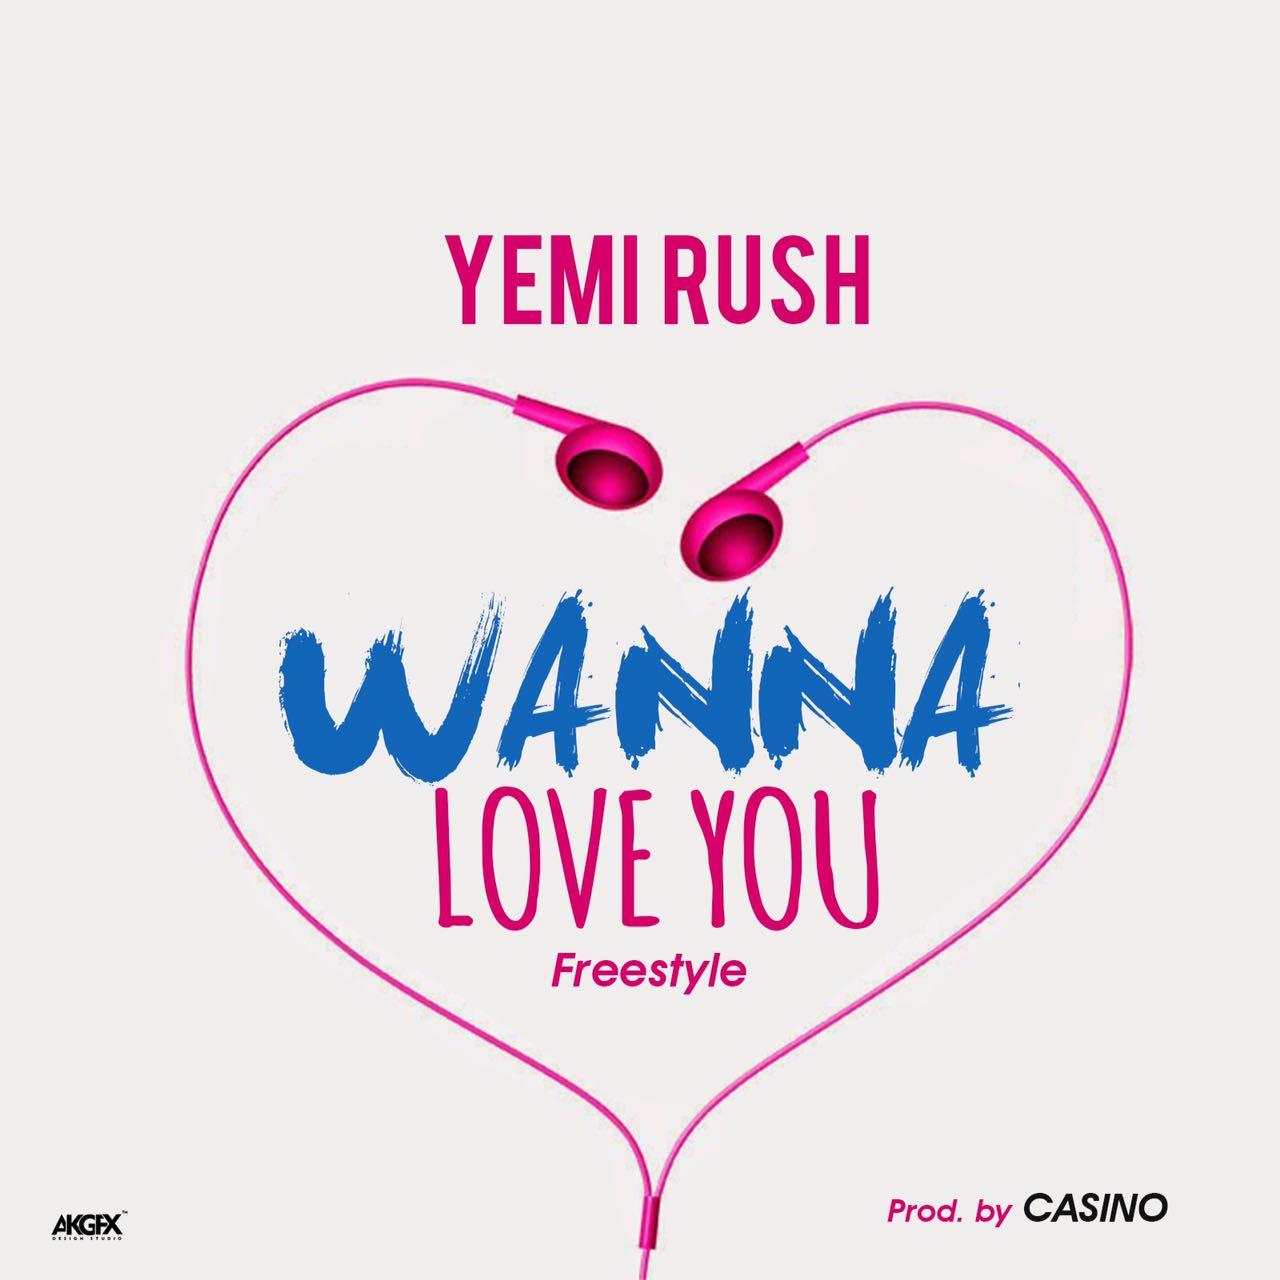 Yemi Rush - Wanna Love You (Freestyle)